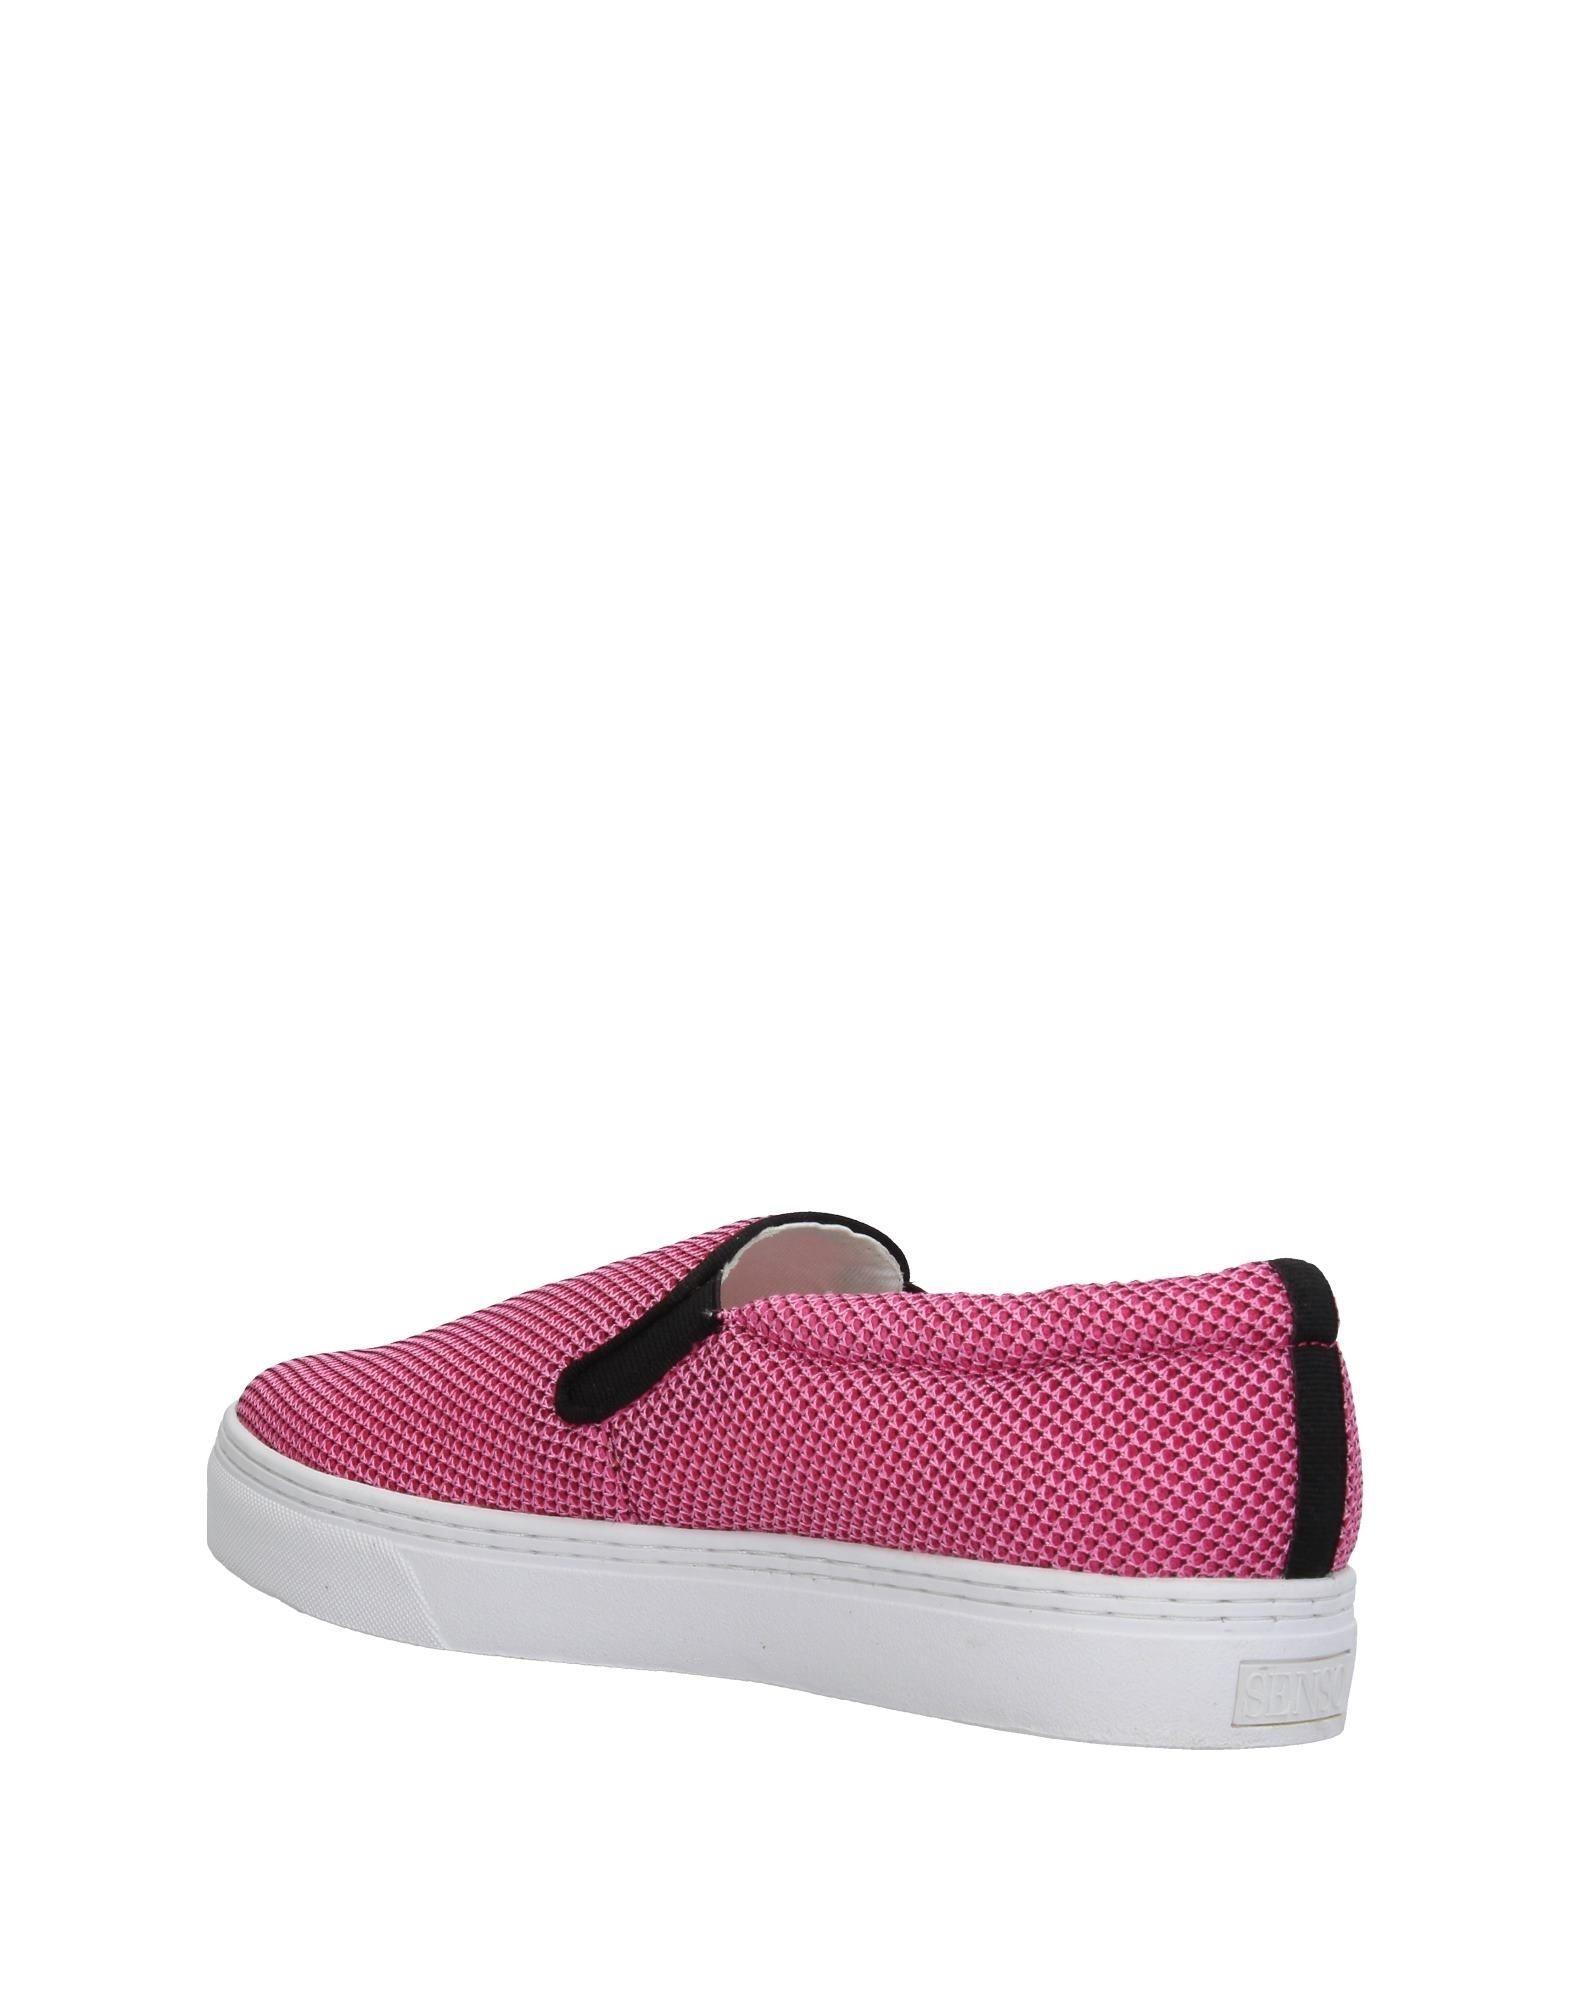 FOOTWEAR Senso Pink Woman Textile fibres